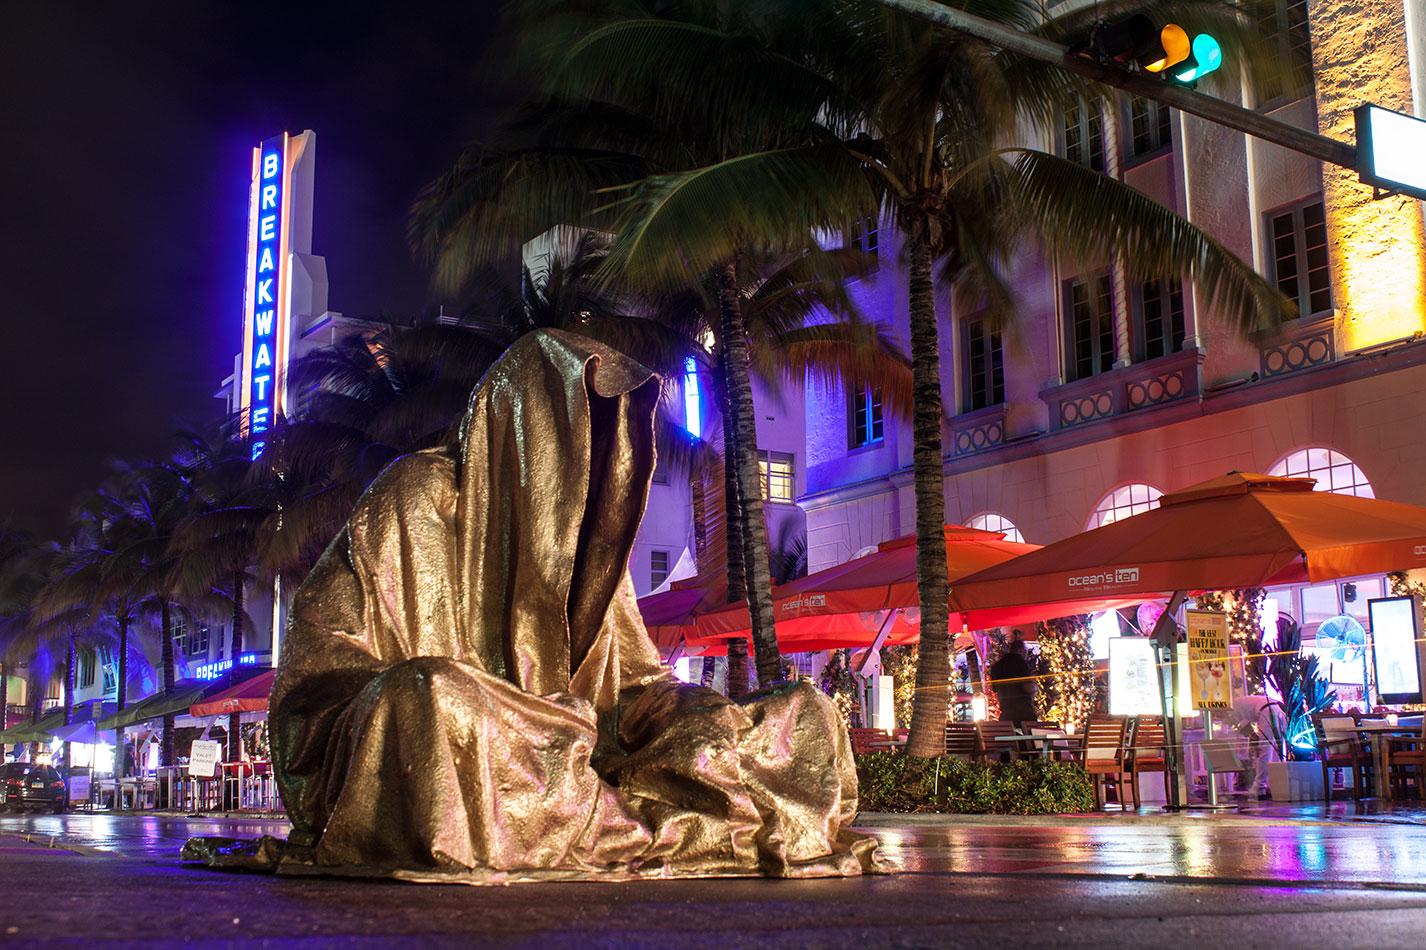 public-art-basel-miami-beach-fair-usa-florida-bass-museum-guardians-of-time-manfred-kili-kielnhofer-contemporary-fine-art-modern-arts-design-antiques-sculpture-6623